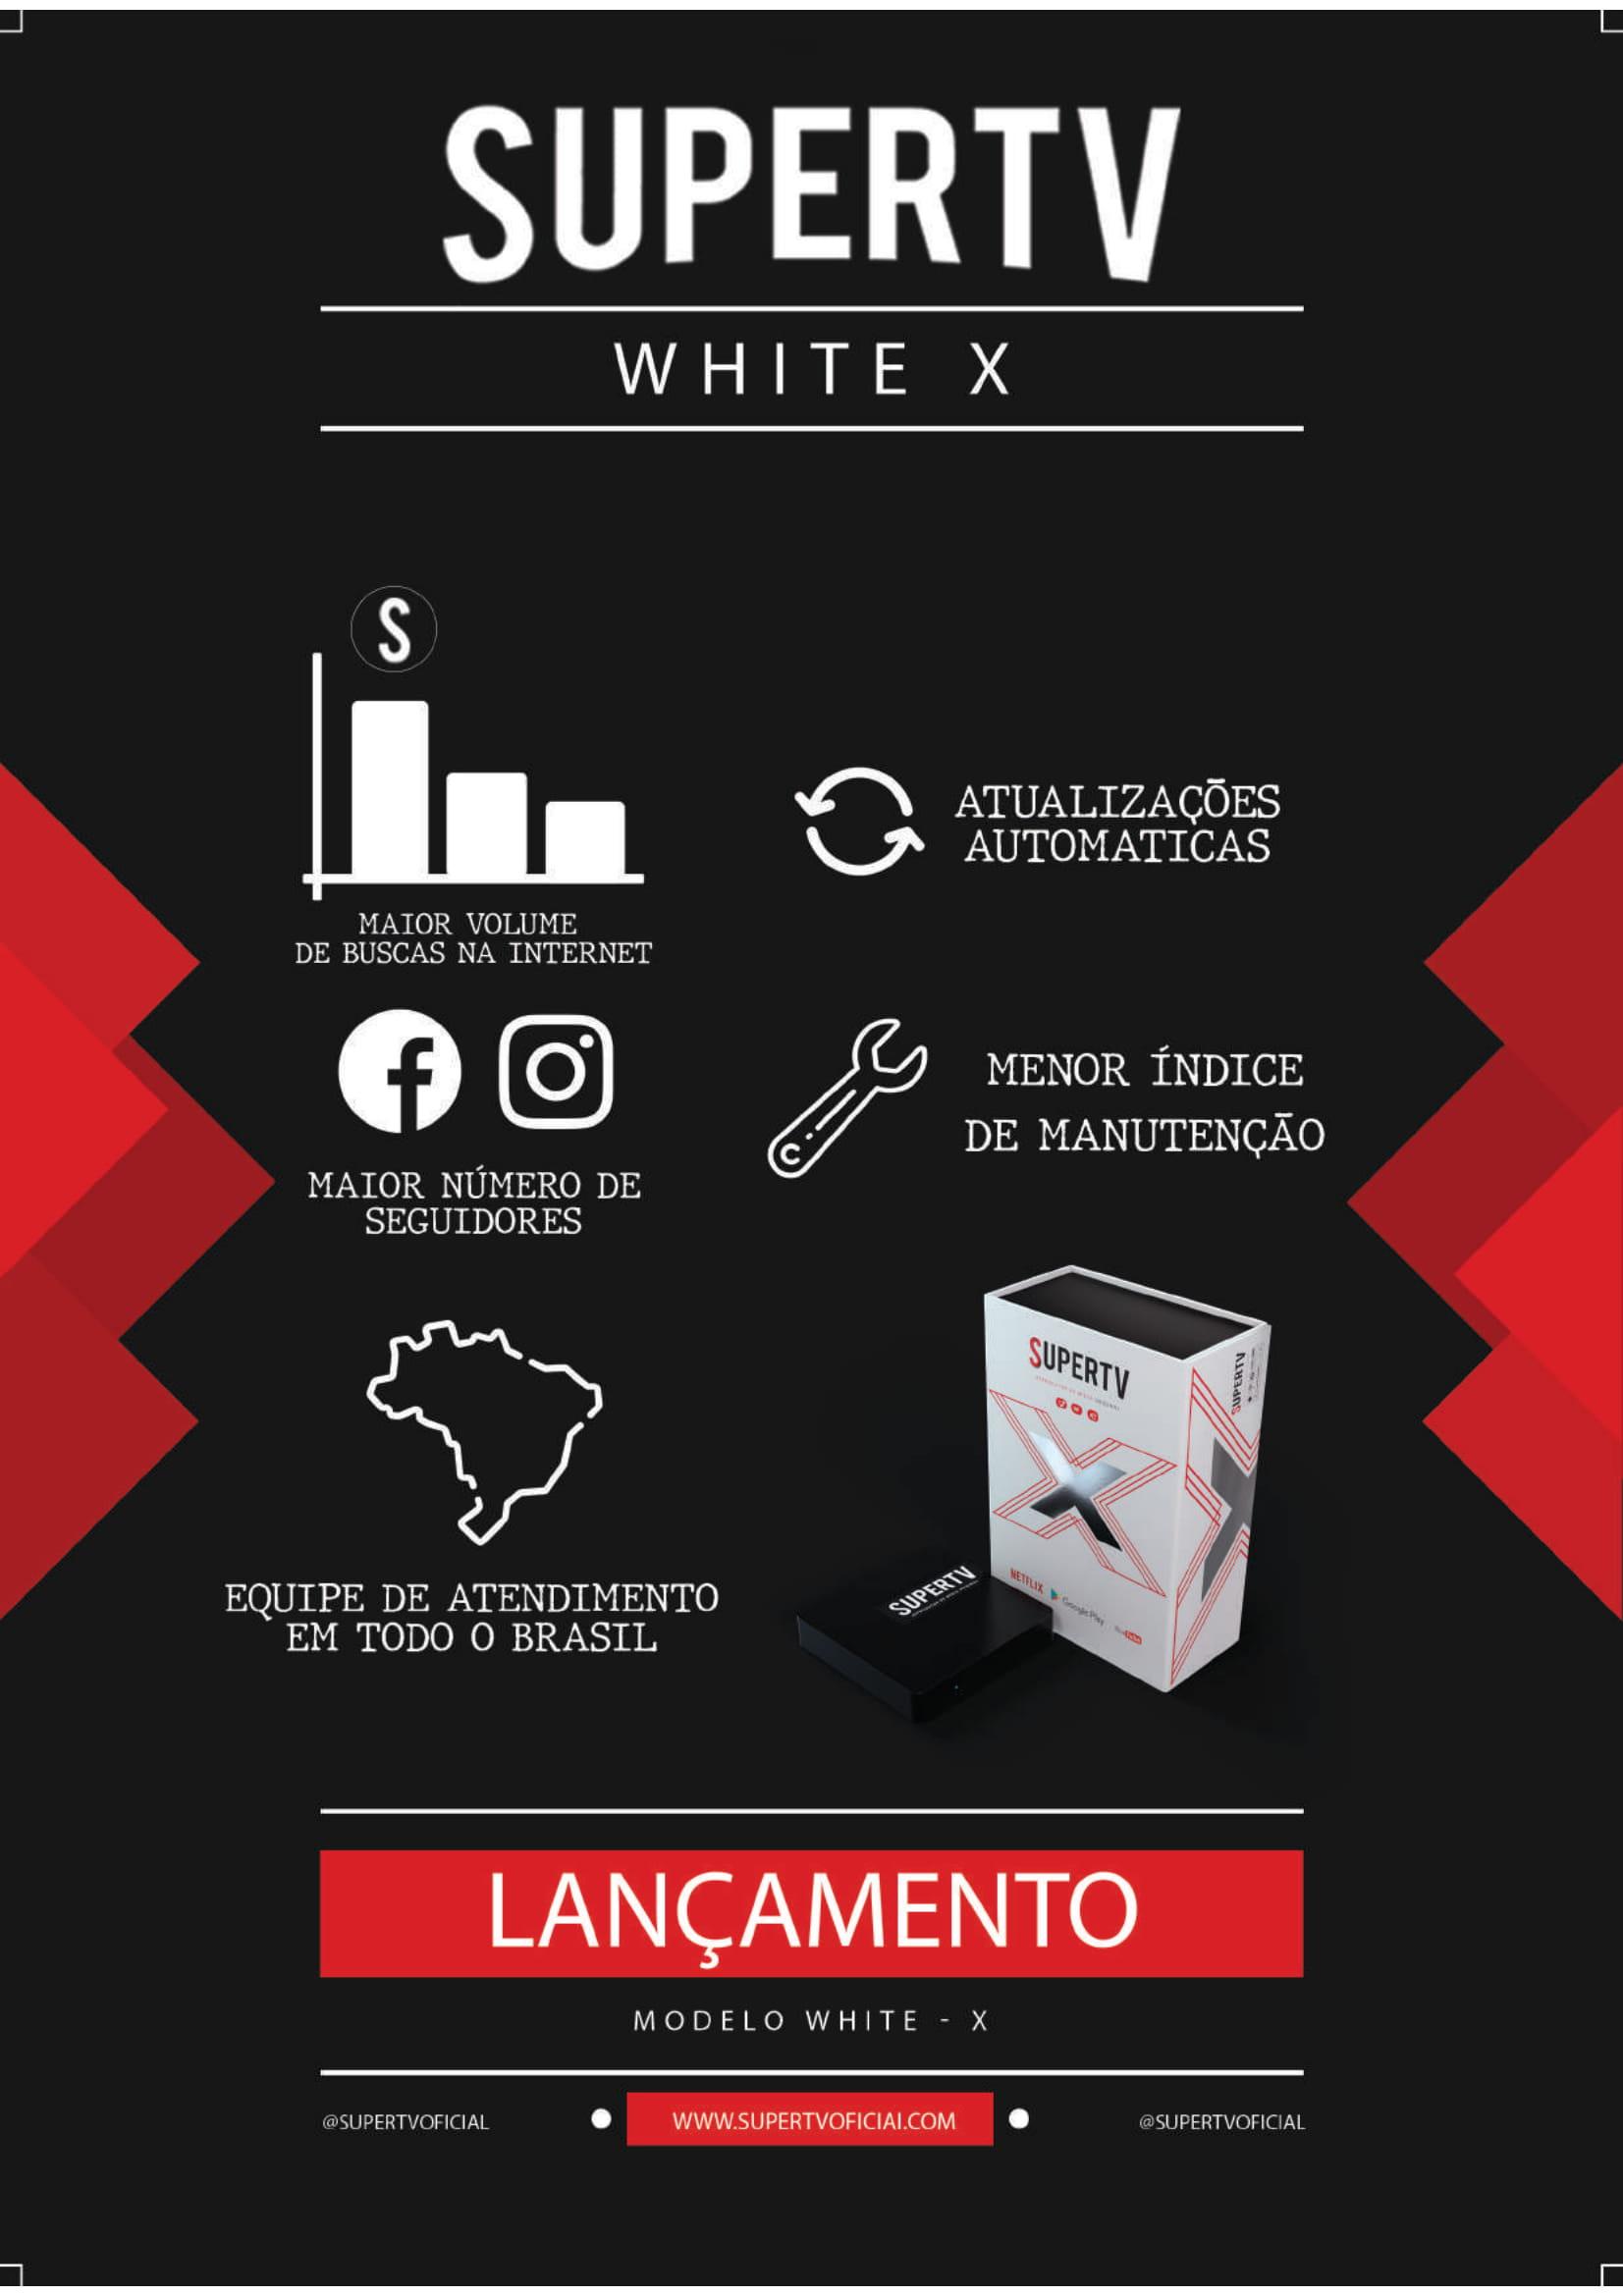 white-x-pdf-4.jpg